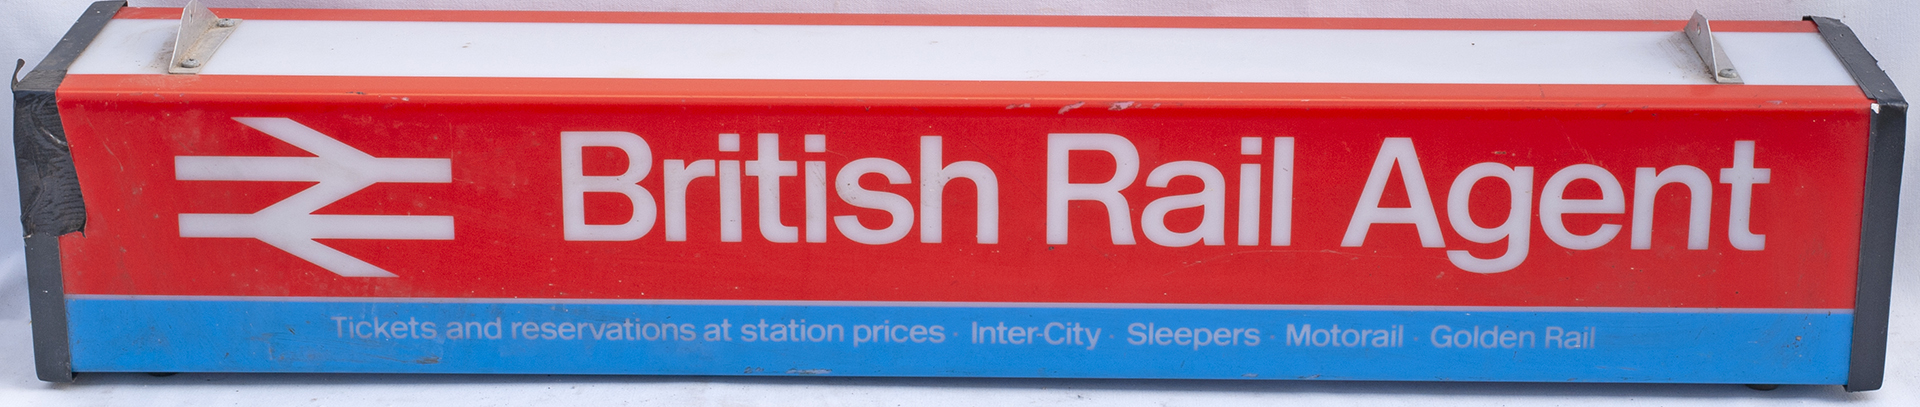 British Rail Agent Illuminated Perspex Light Box